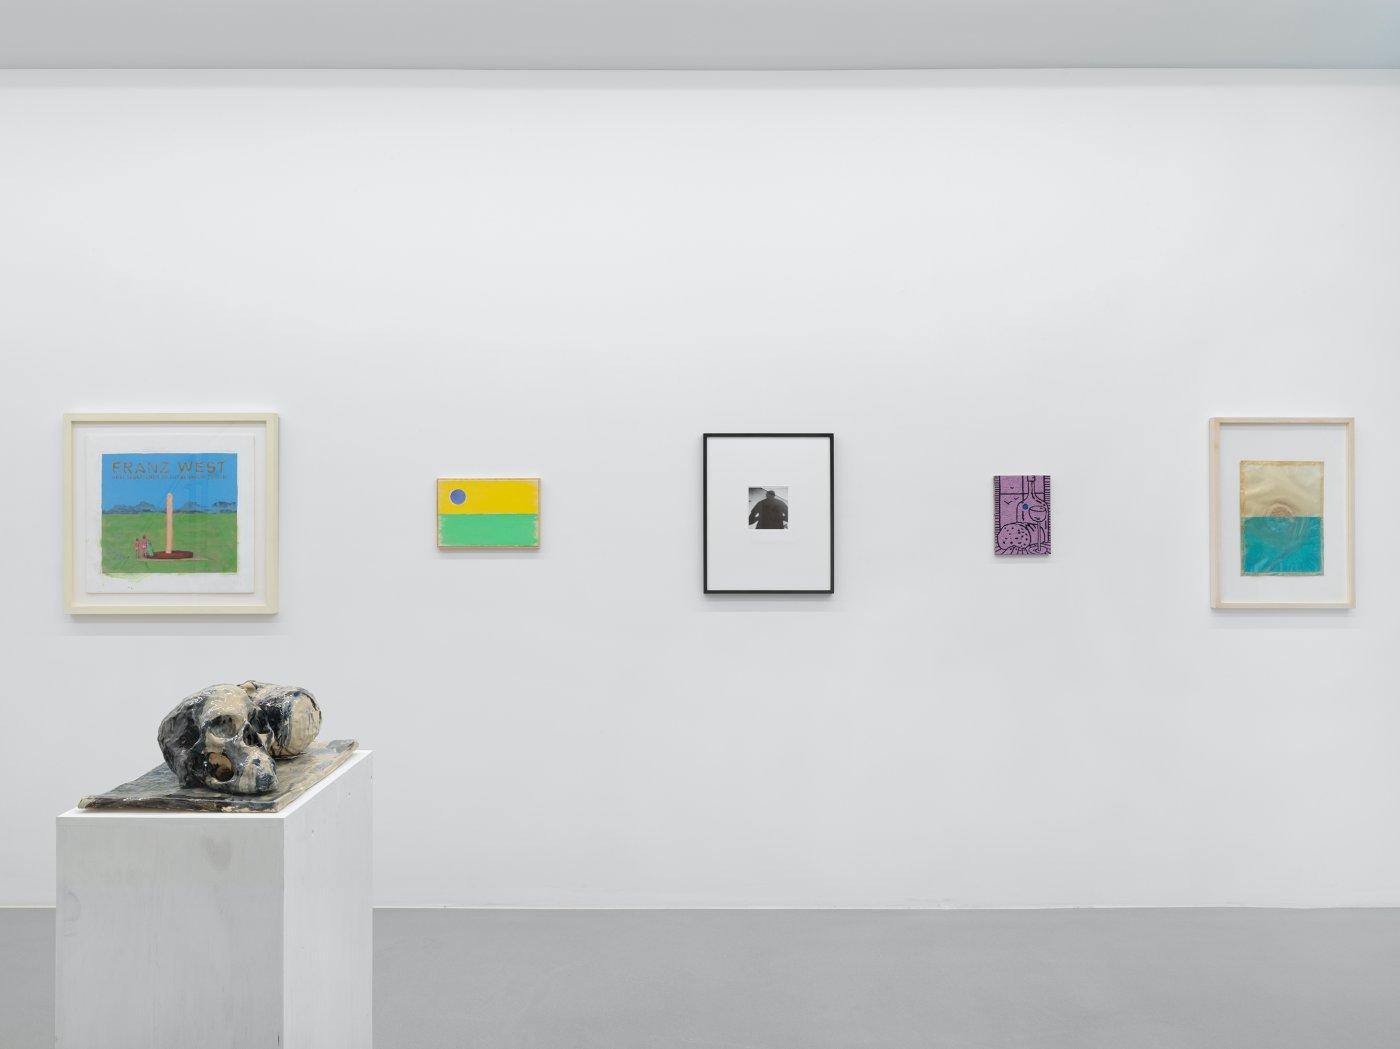 Galerie Eva Presenhuber All in One 2